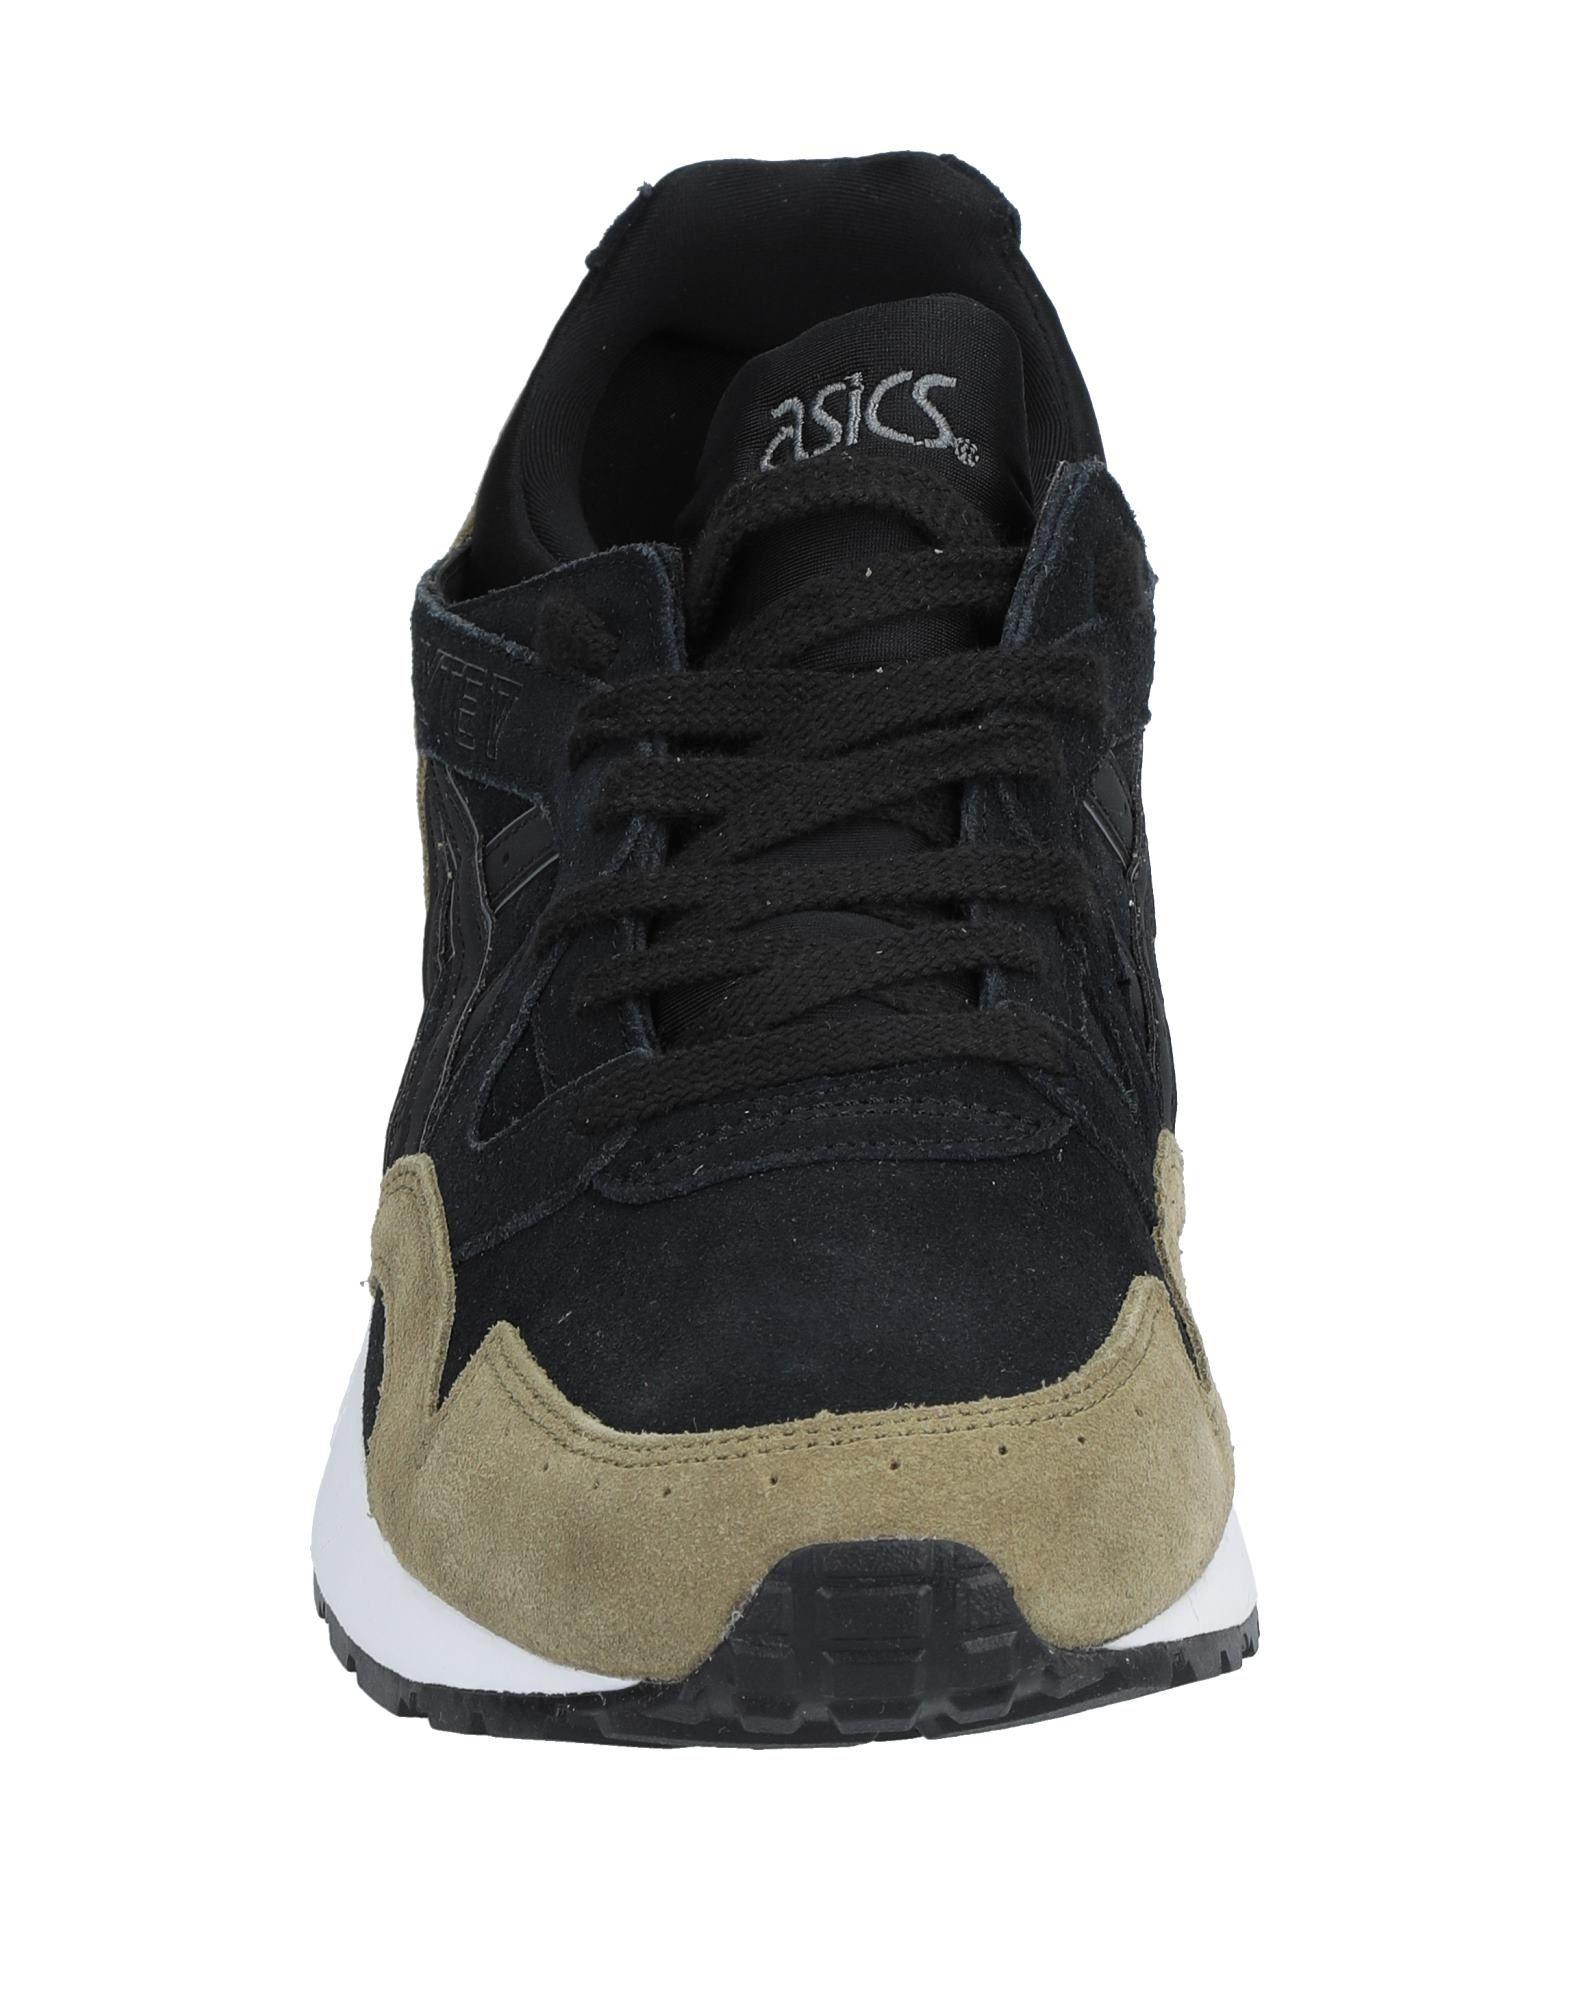 Rabatt Asics echte Schuhe Asics Rabatt Tiger Turnschuhes Herren 11535677LA 142d49